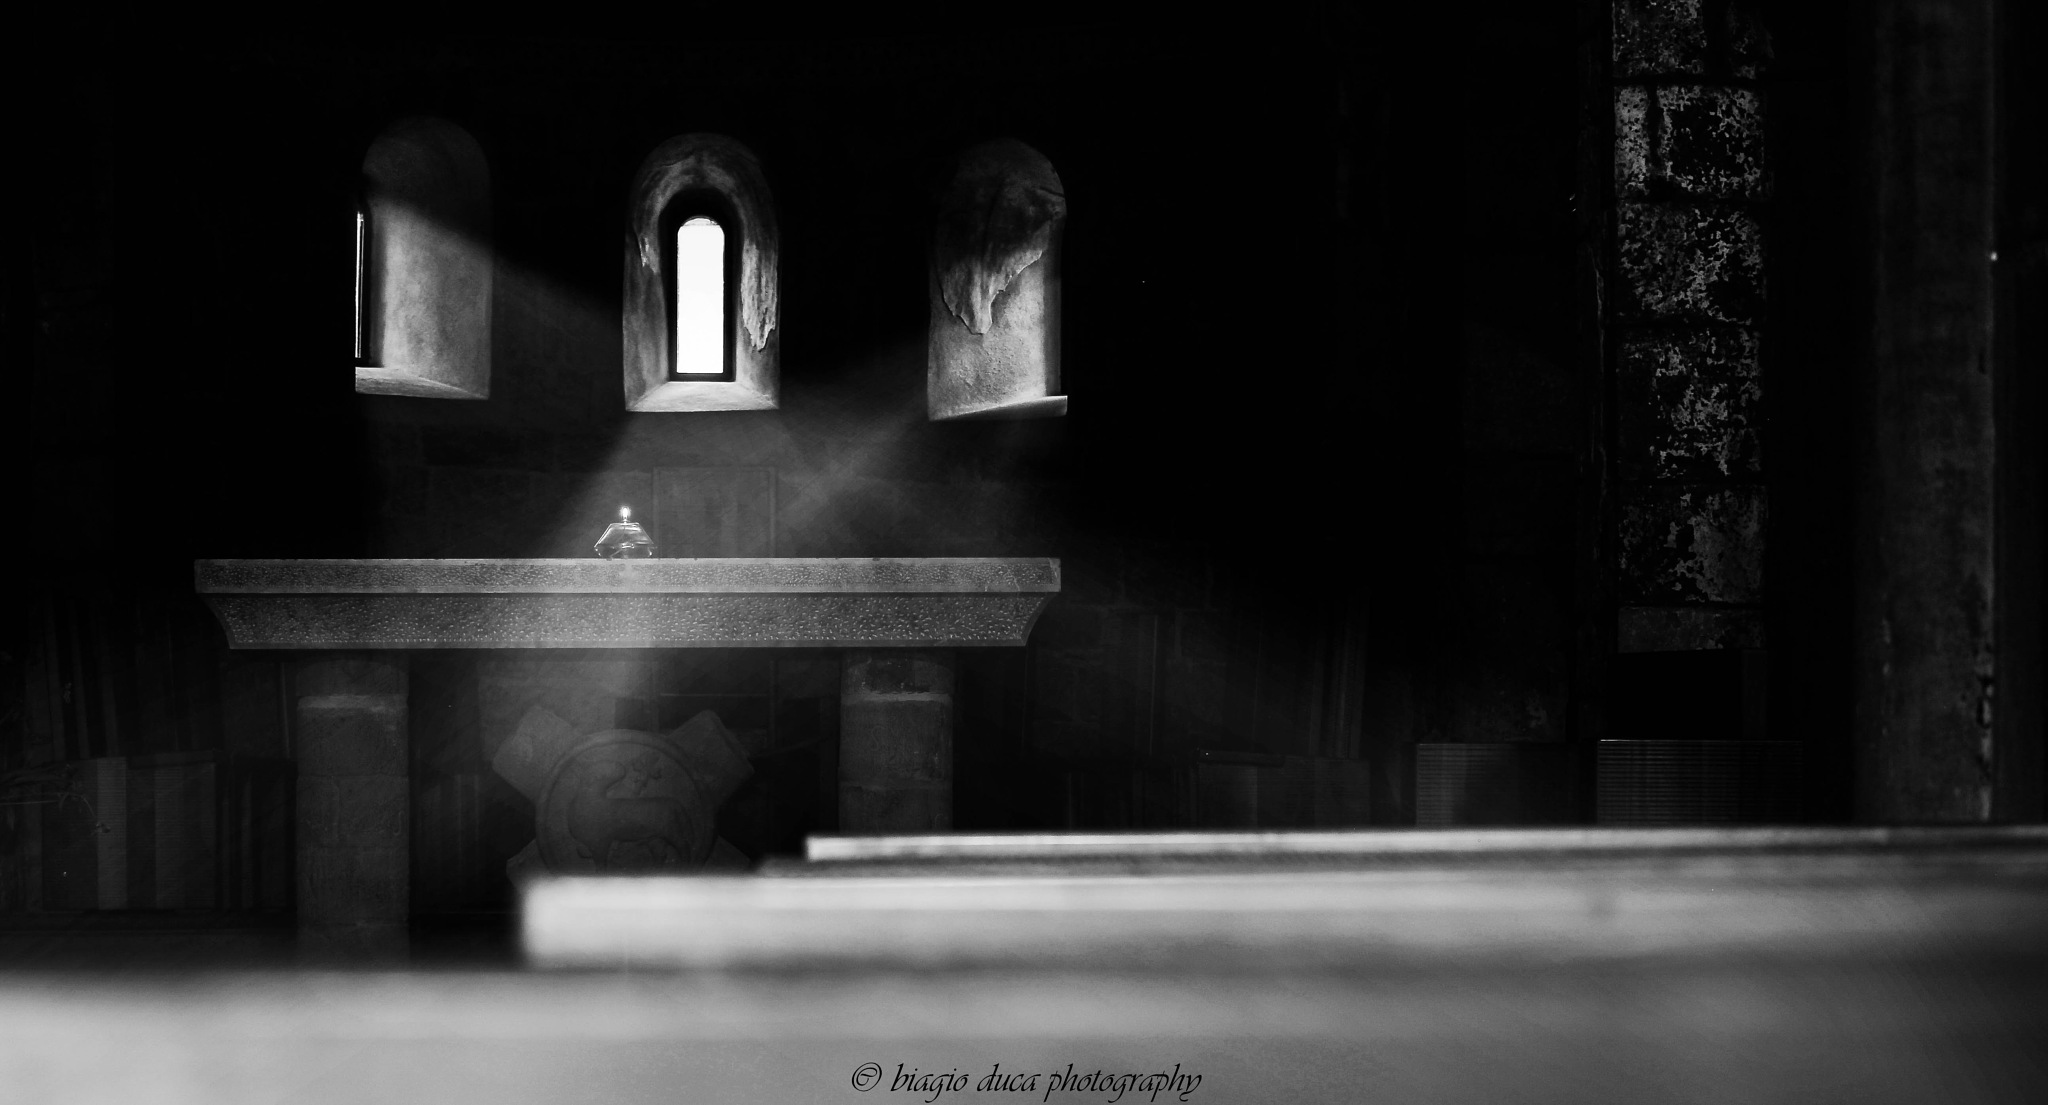 Untitled by Biagio Duca